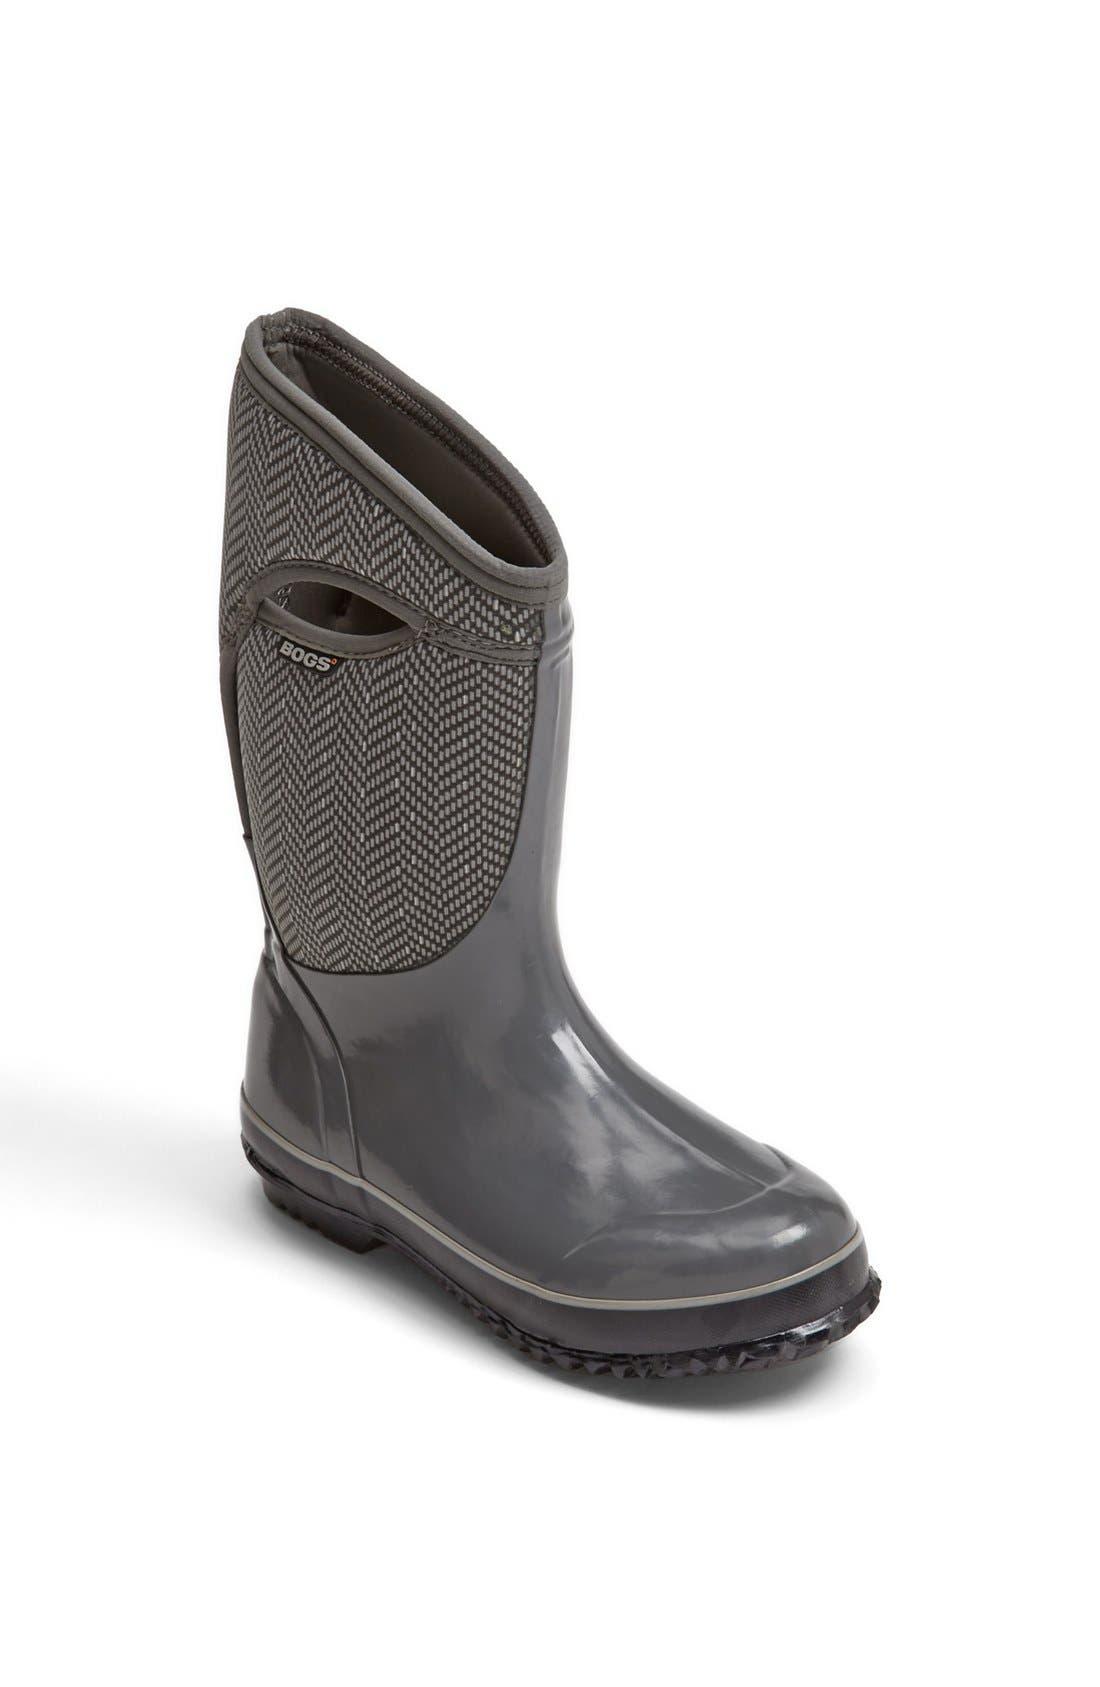 Main Image - Bogs Footwear 'Plimsoll' Boot (Little Kid & Big Kid)